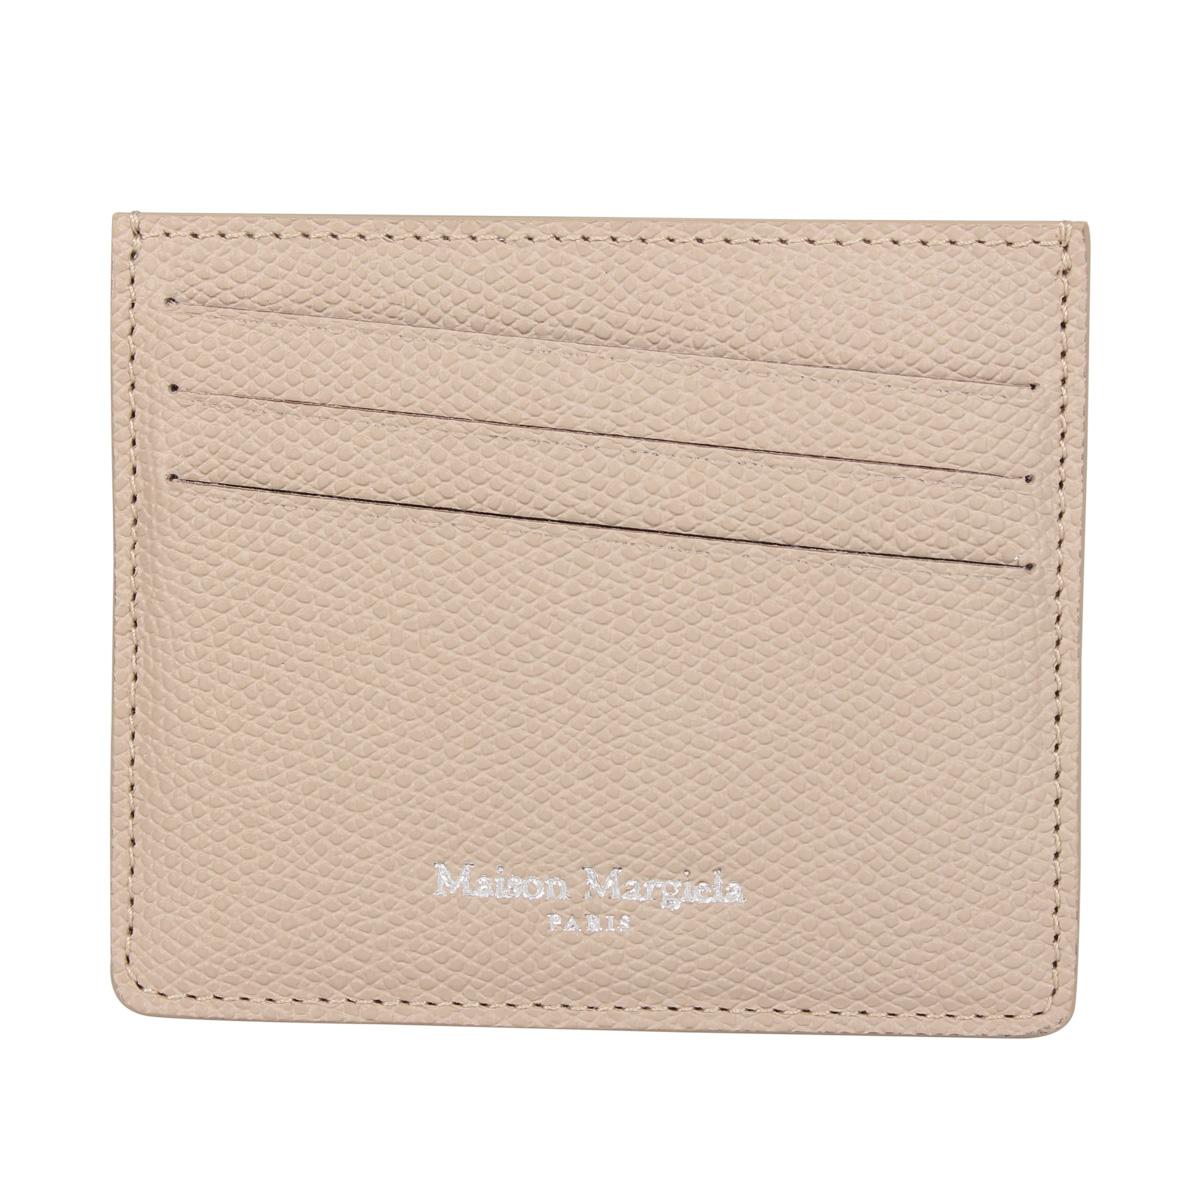 MAISON MARGIELA CARD CASE メゾンマルジェラ カードケース 名刺入れ 定期入れ メンズ レディース ベージュ S35UI0432-T2352